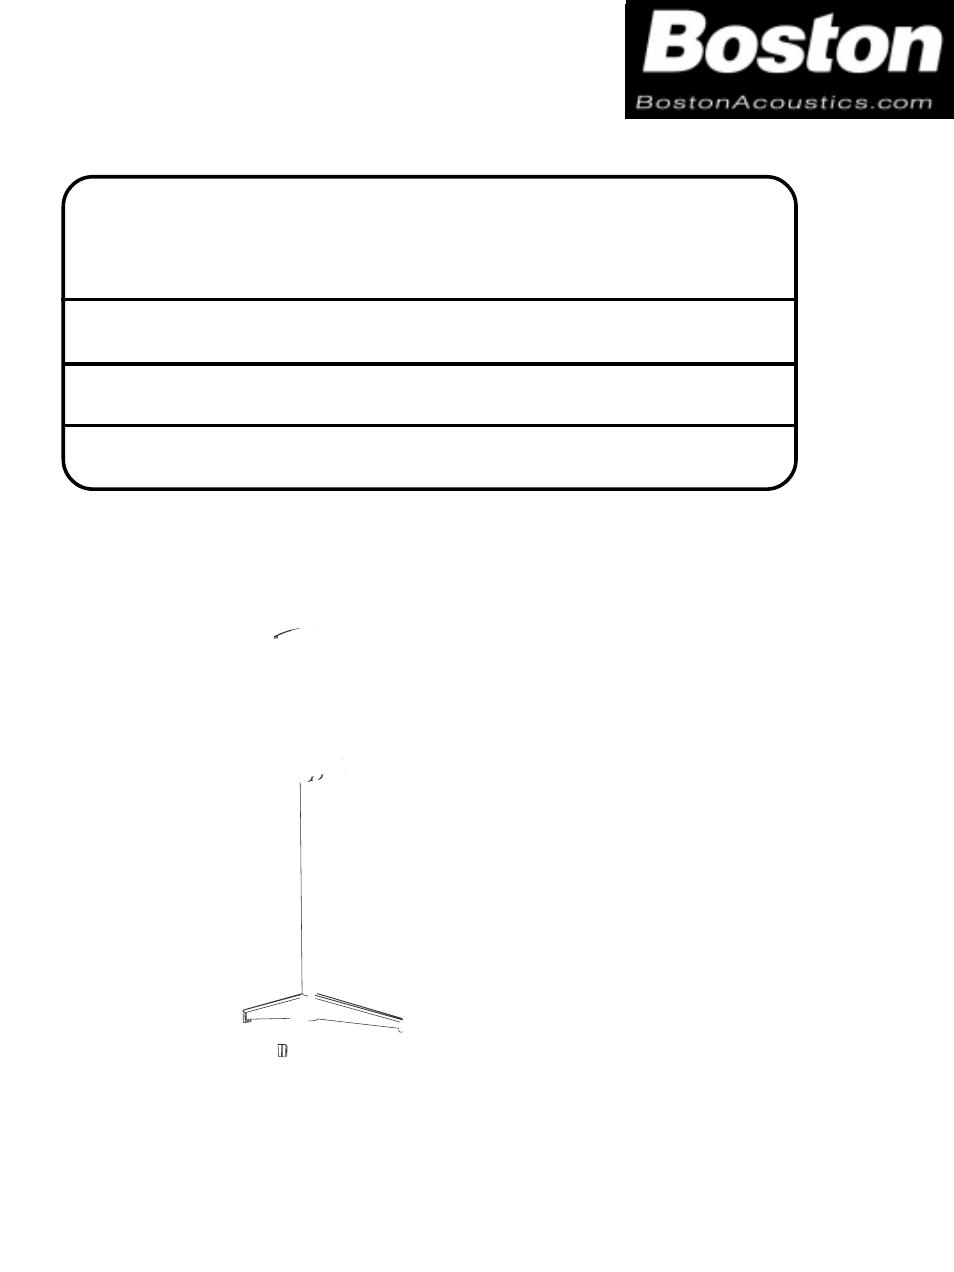 boston acoustics ba7500 user manual 6 pages rh manualsdir com